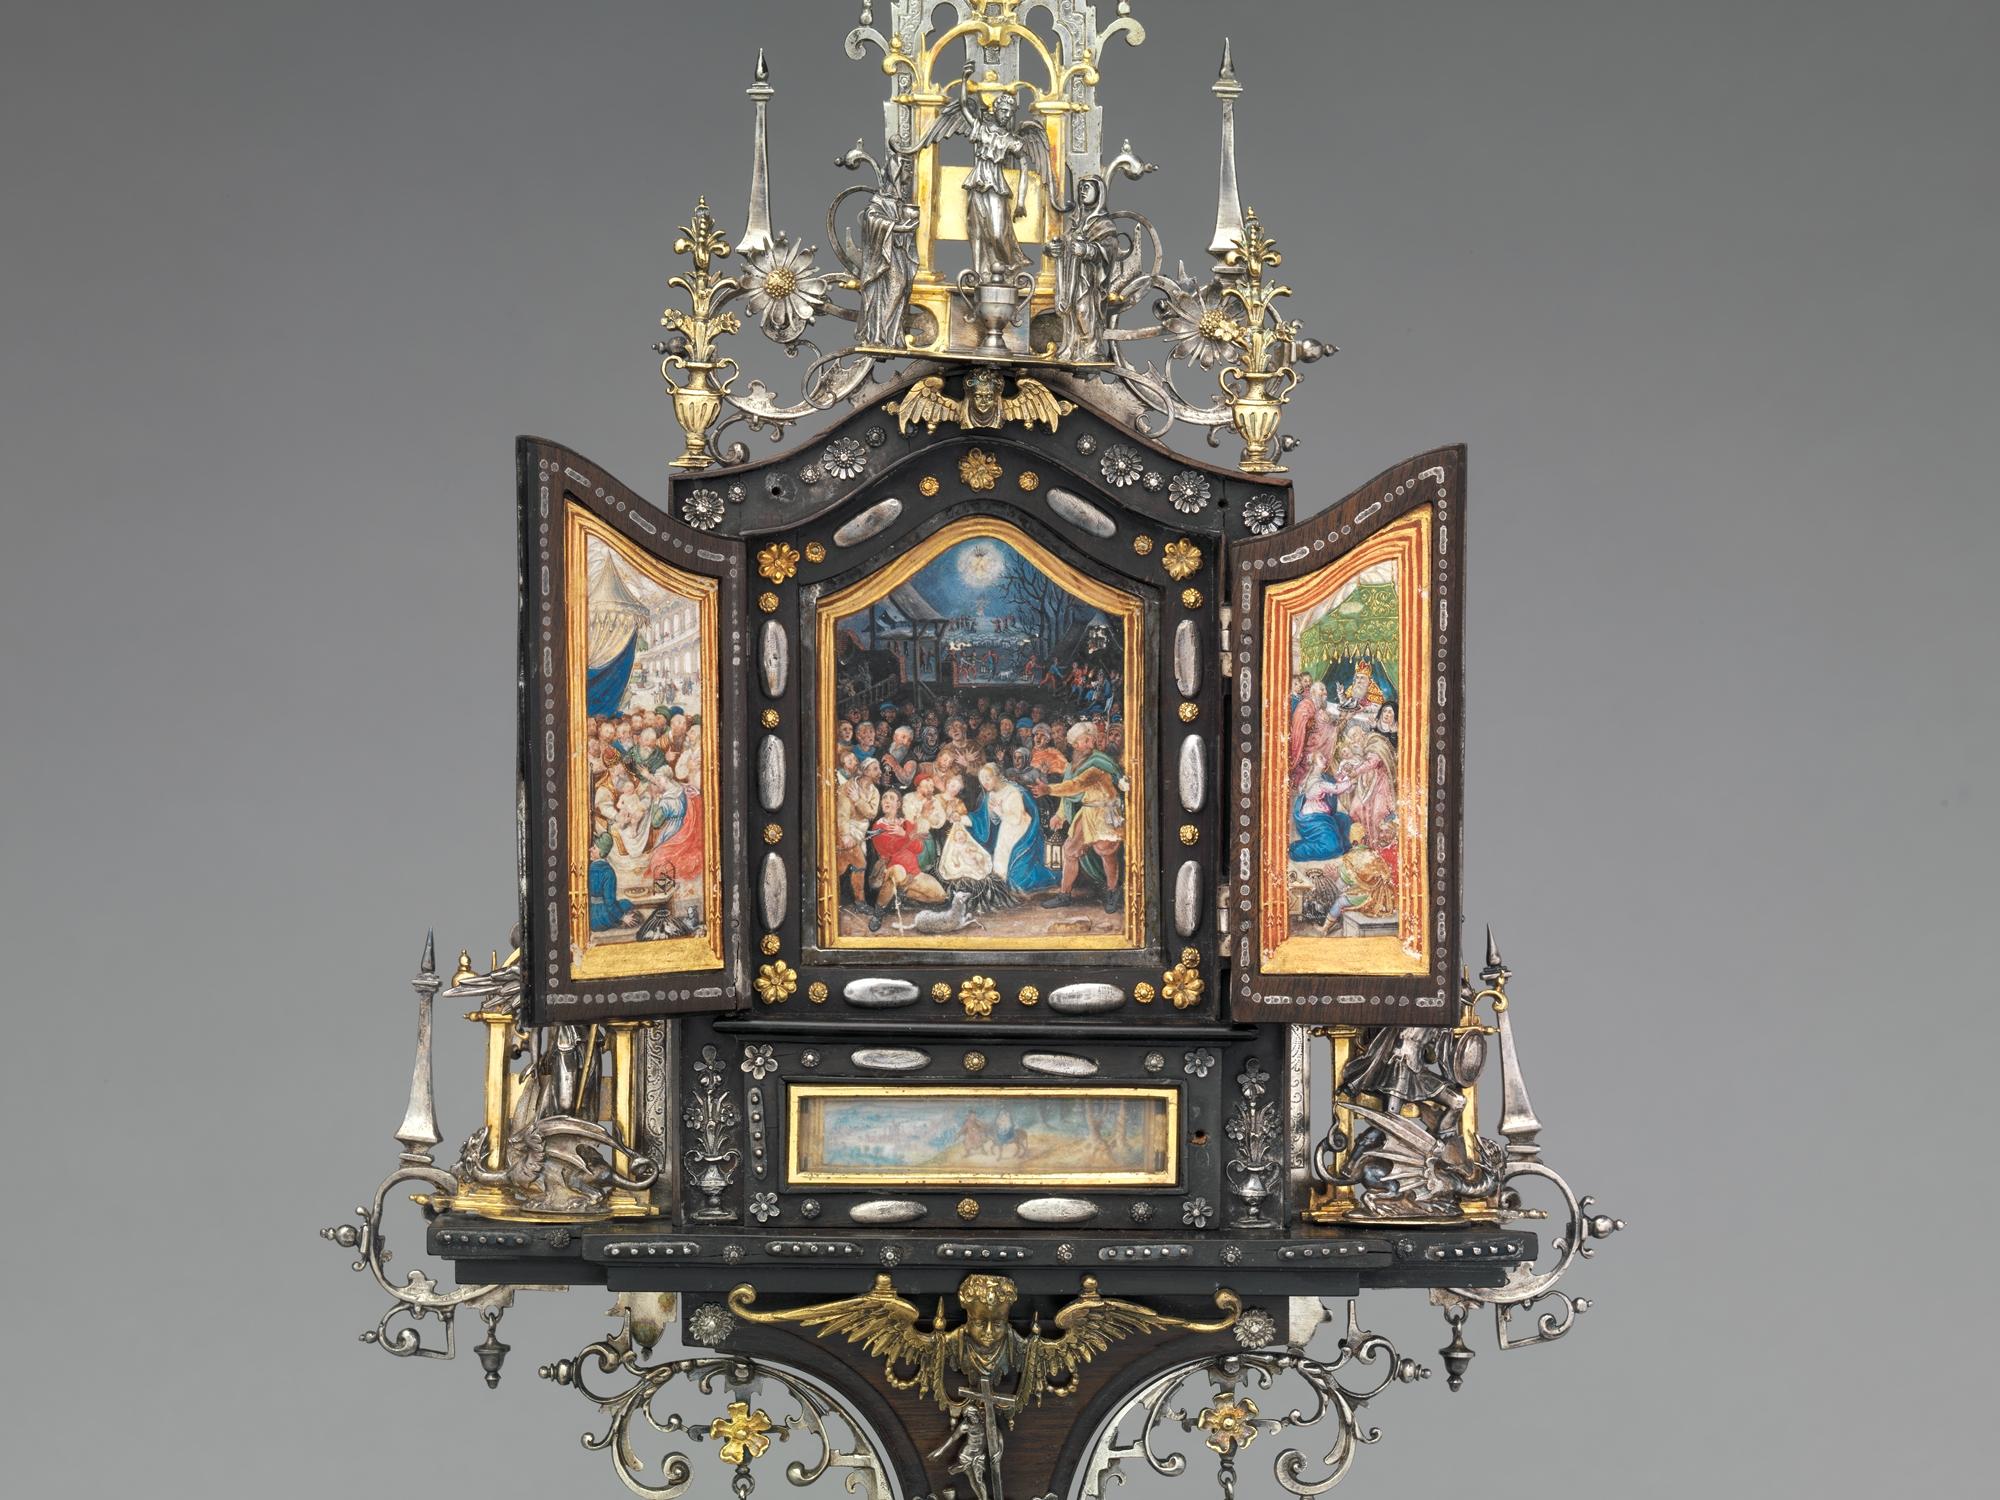 https://images.metmuseum.org/CRDImages/es/original/DP259527.jpg